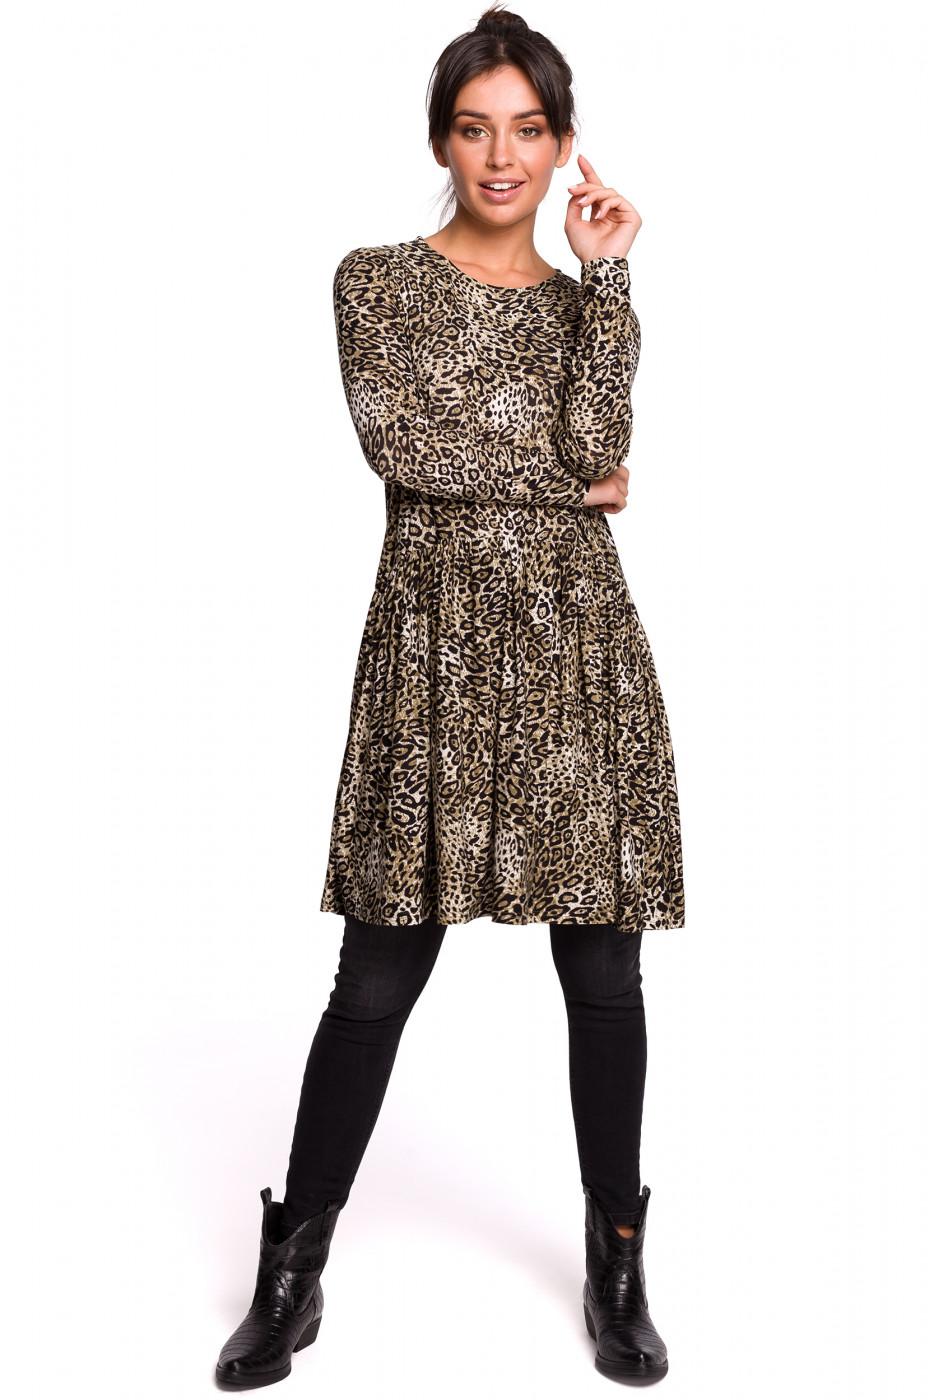 BeWear Woman's Dress B136 Model 2